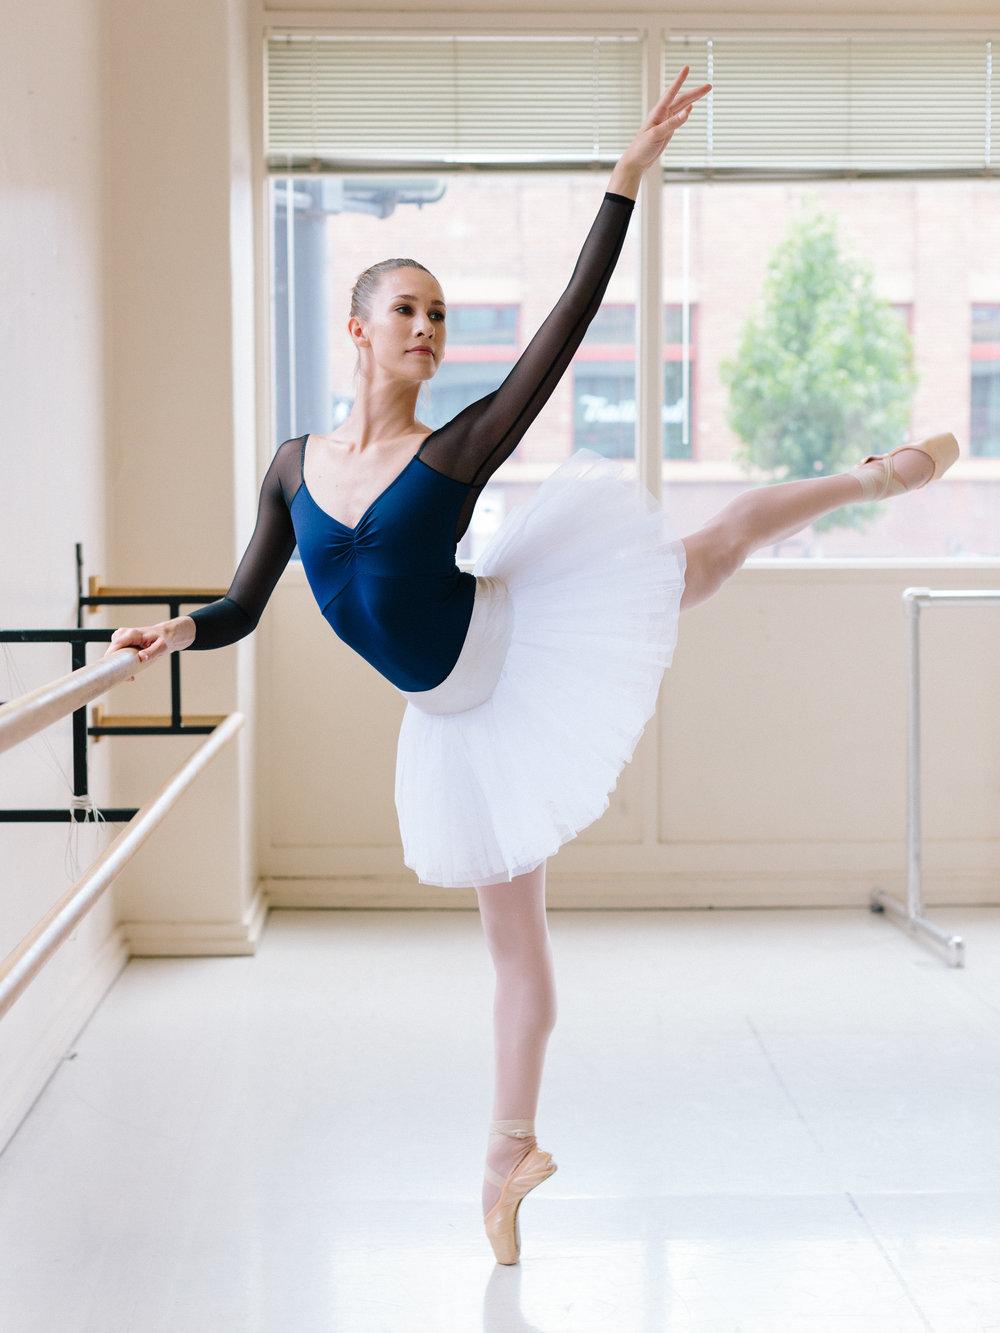 Jessica_Ballet-5.JPG